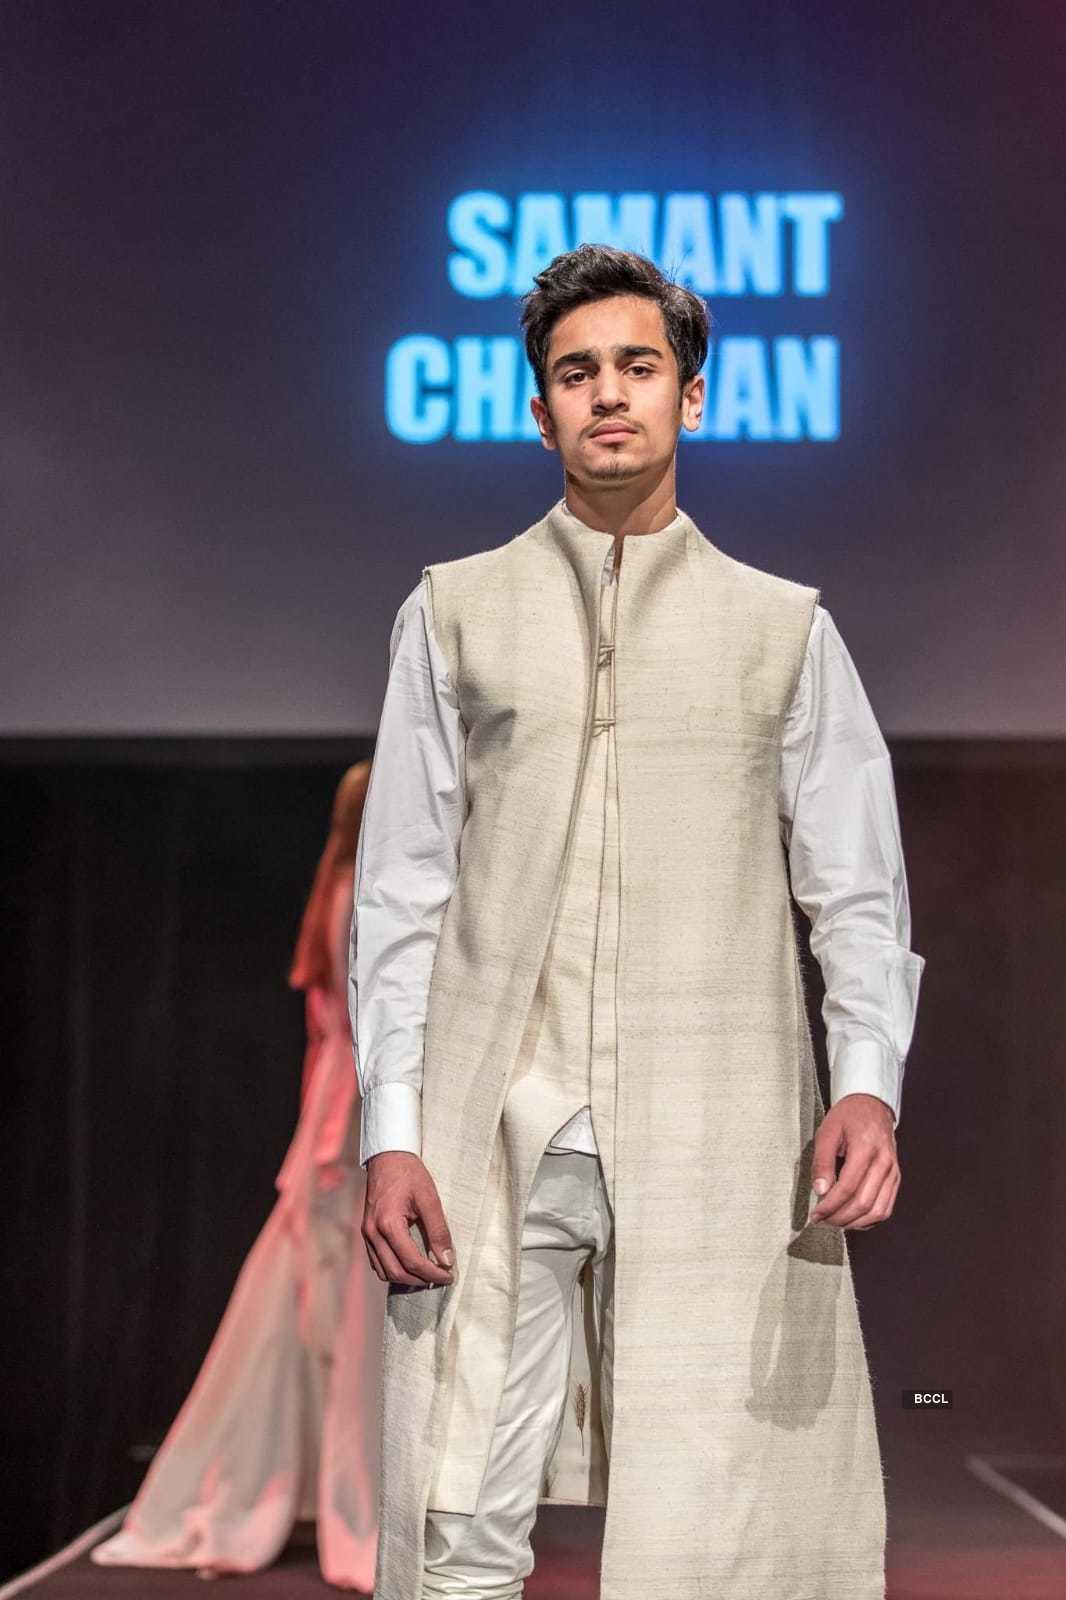 Raaz actor Vishwajeet Pradhan's son Ojasvi Pradhan taking baby steps in the fashion industry